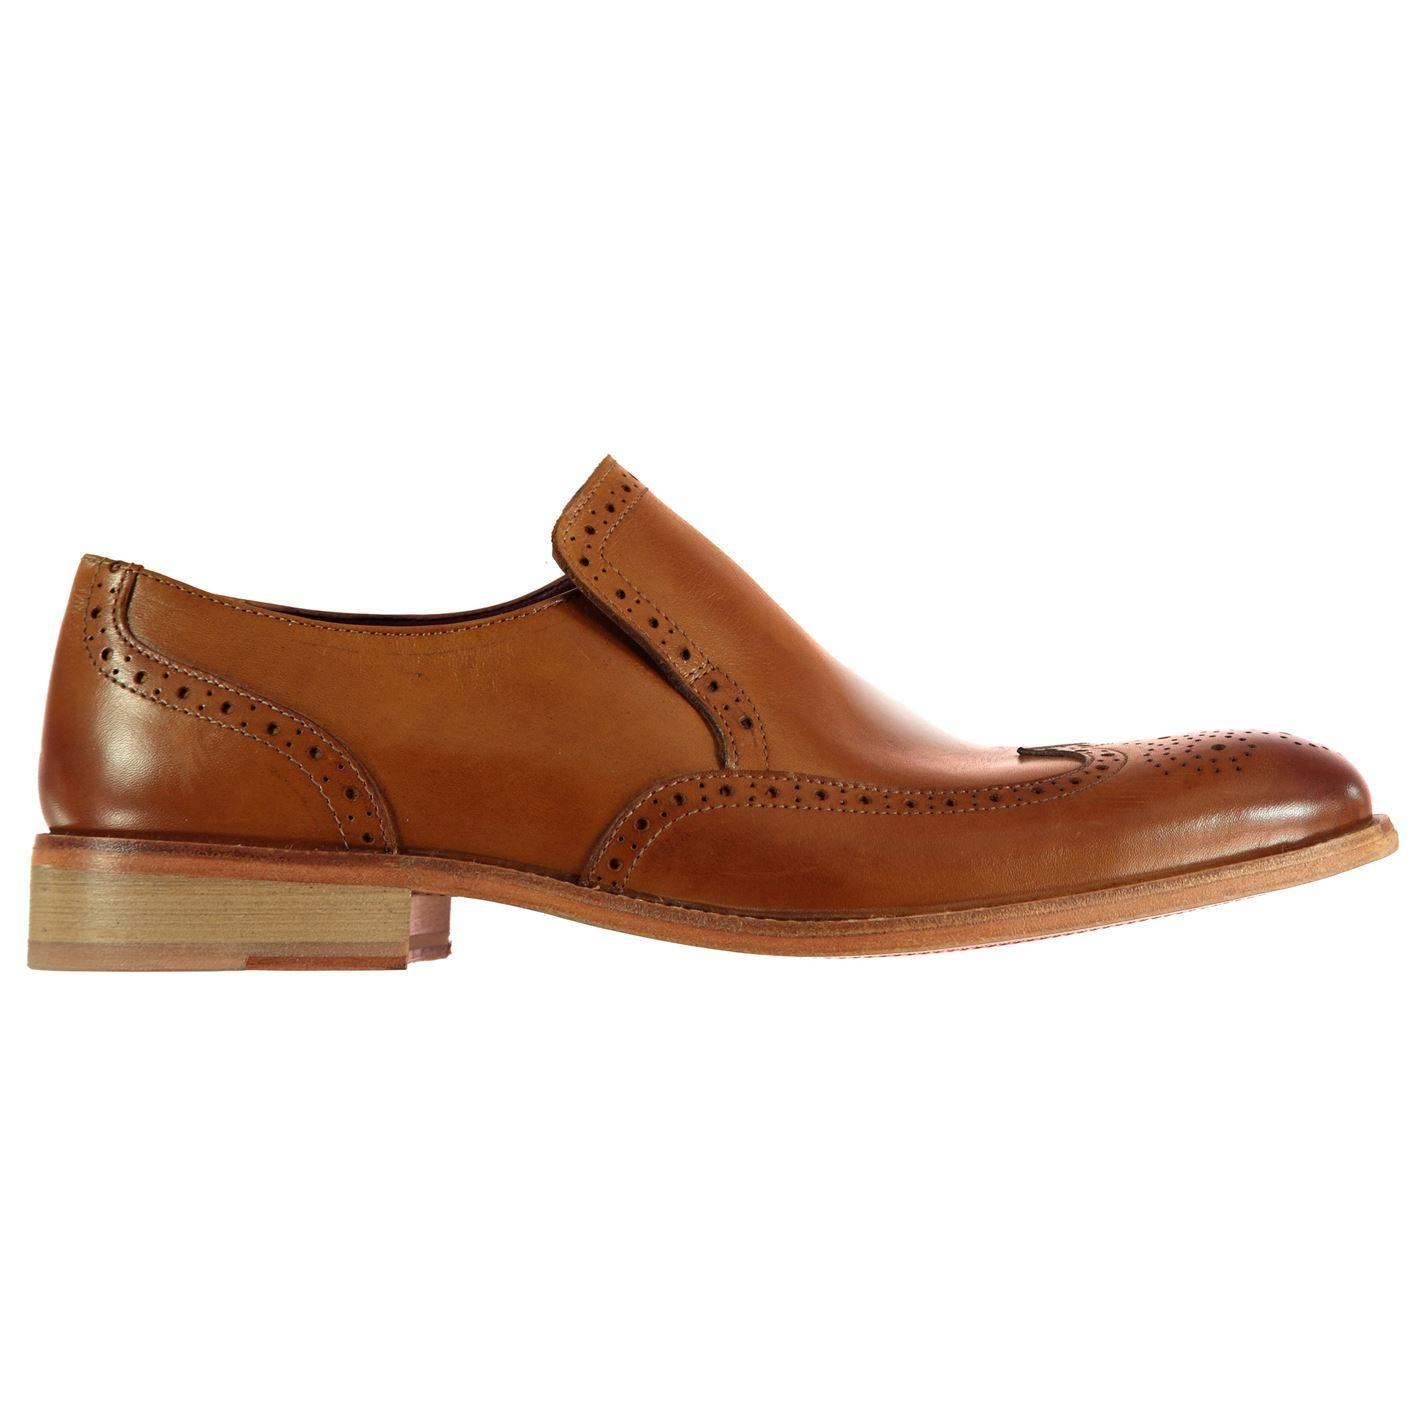 Firetrap Somerset Slip On Brogue Shoes